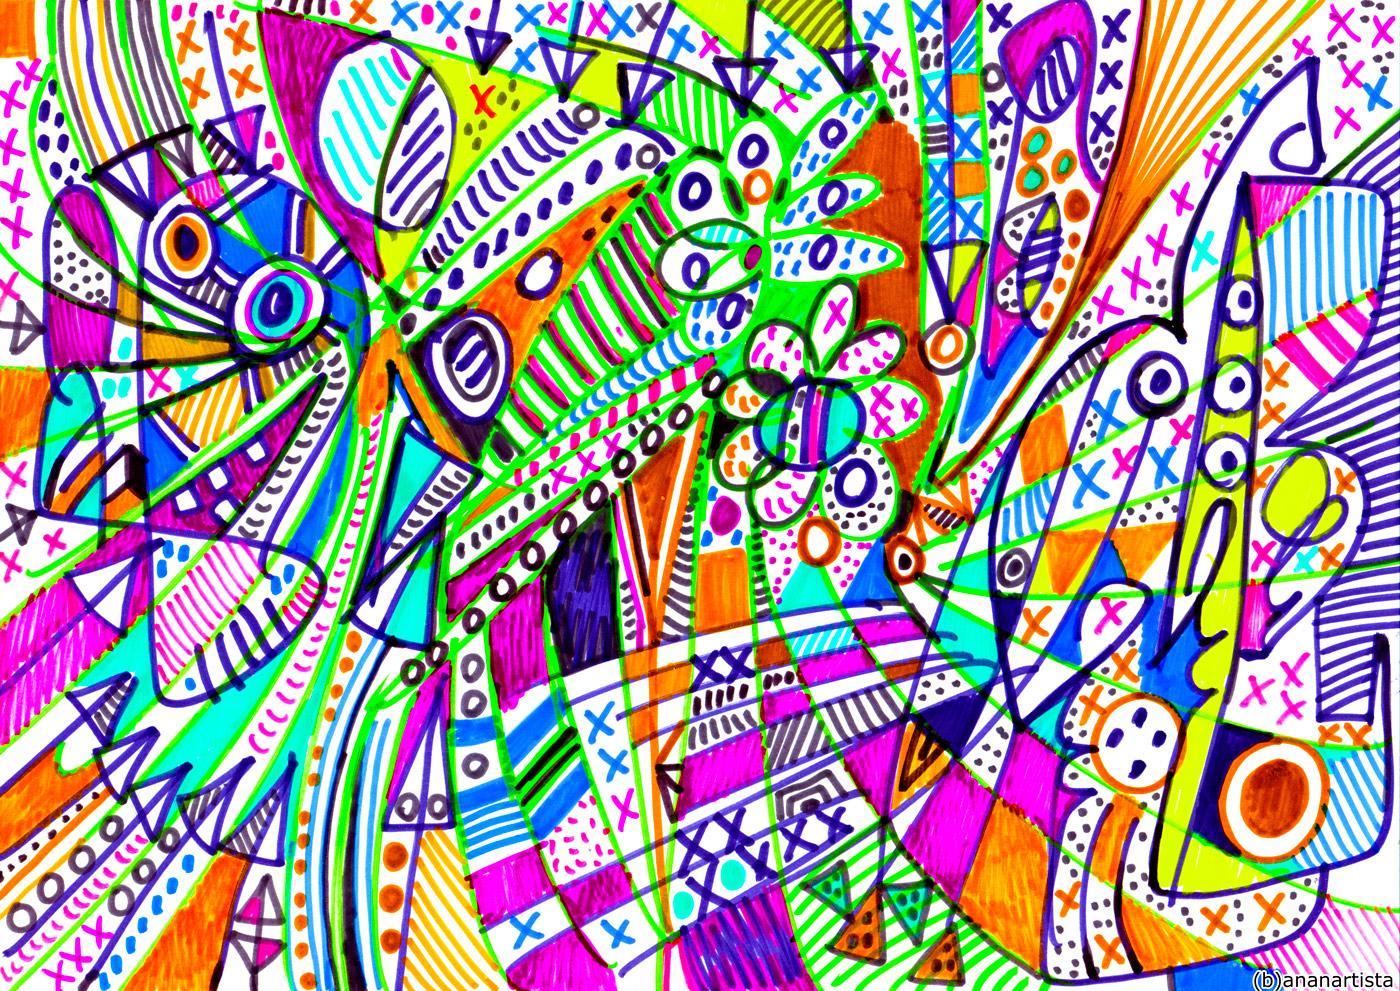 ubiquitous színezett heresy : contemporary art by (b)ananartista sbuff